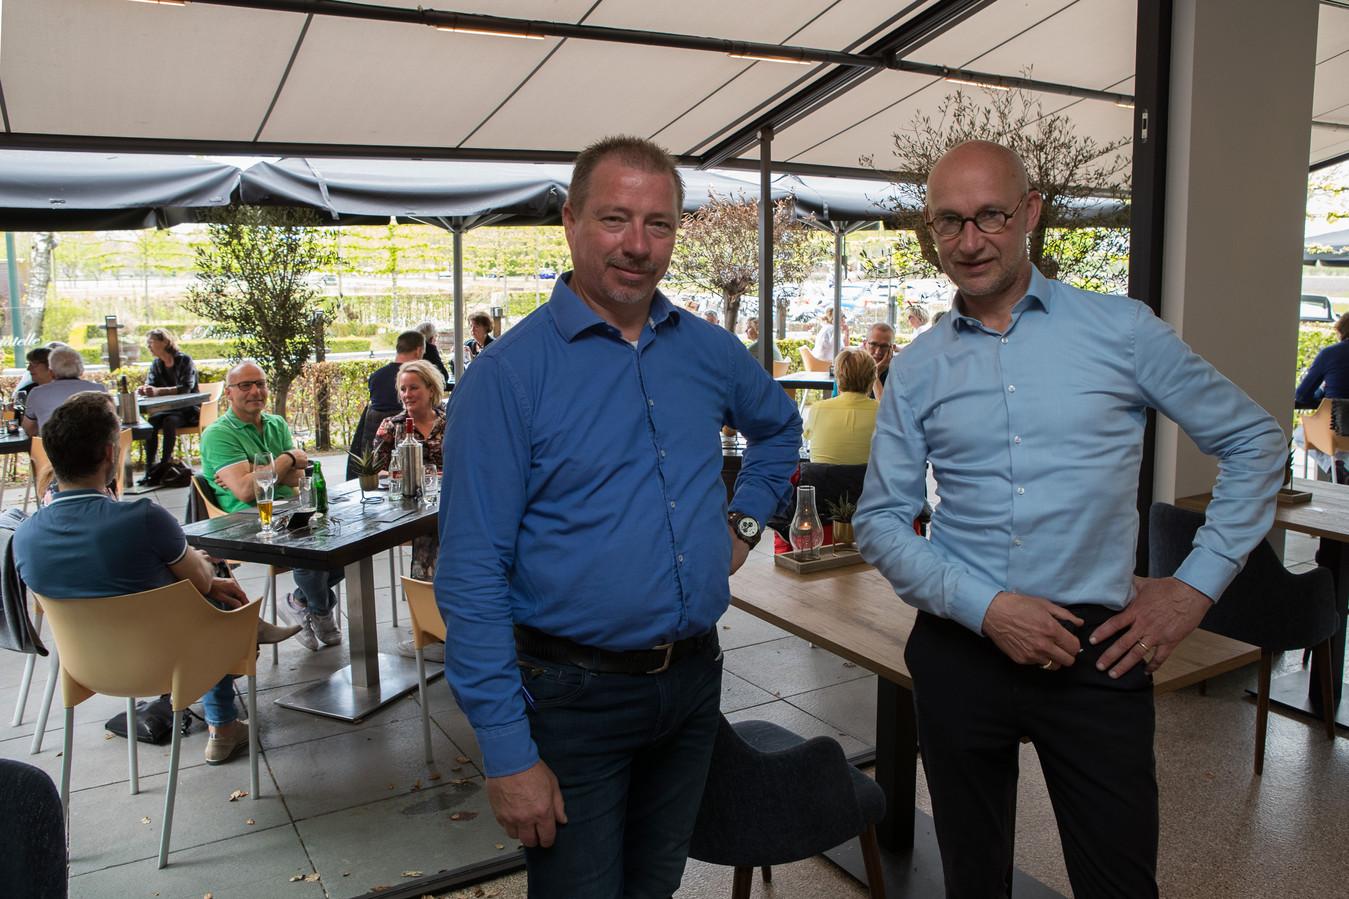 Trotse eigenaren van De Bagatelle Arno en Willy Huisken